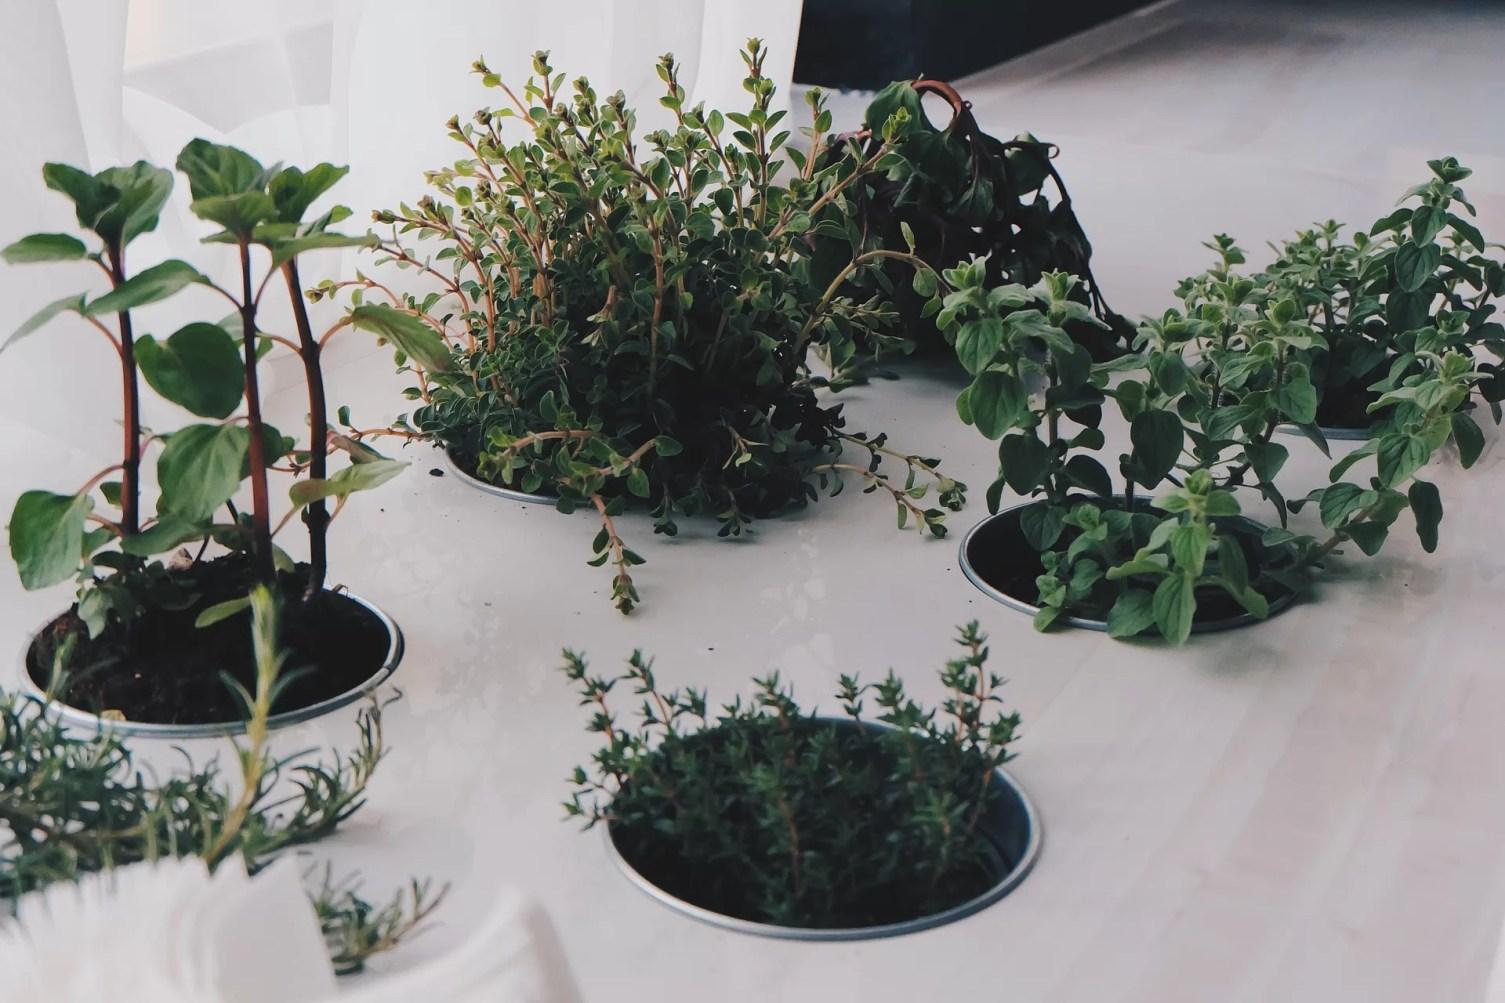 plants-789657_1920.jpg